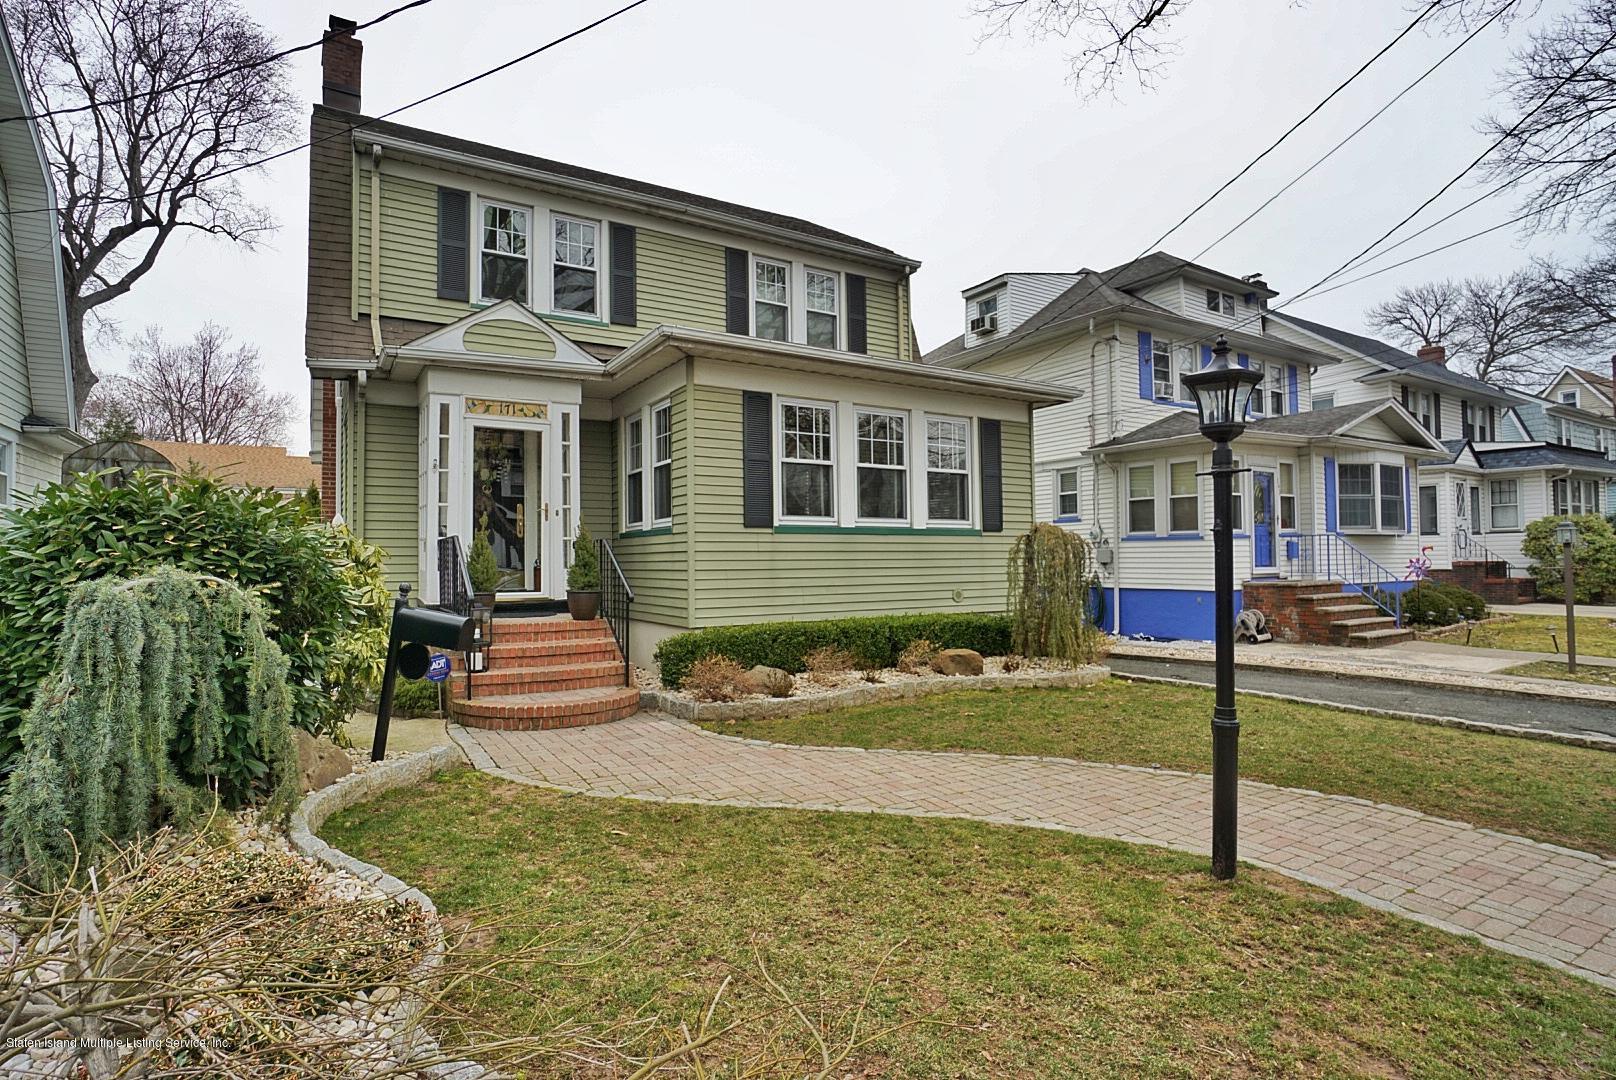 Single Family - Detached 171 Keiber Court  Staten Island, NY 10314, MLS-1127425-3